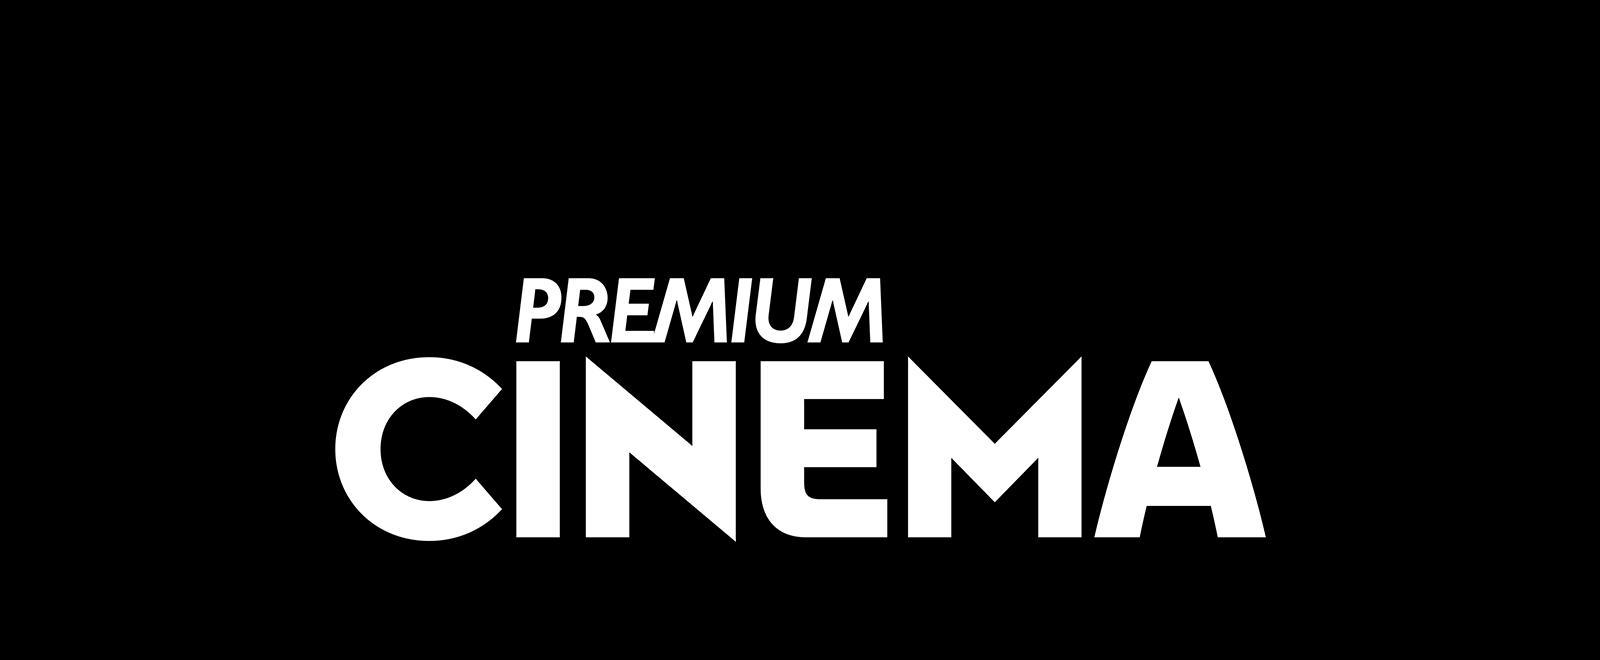 Cinema evento